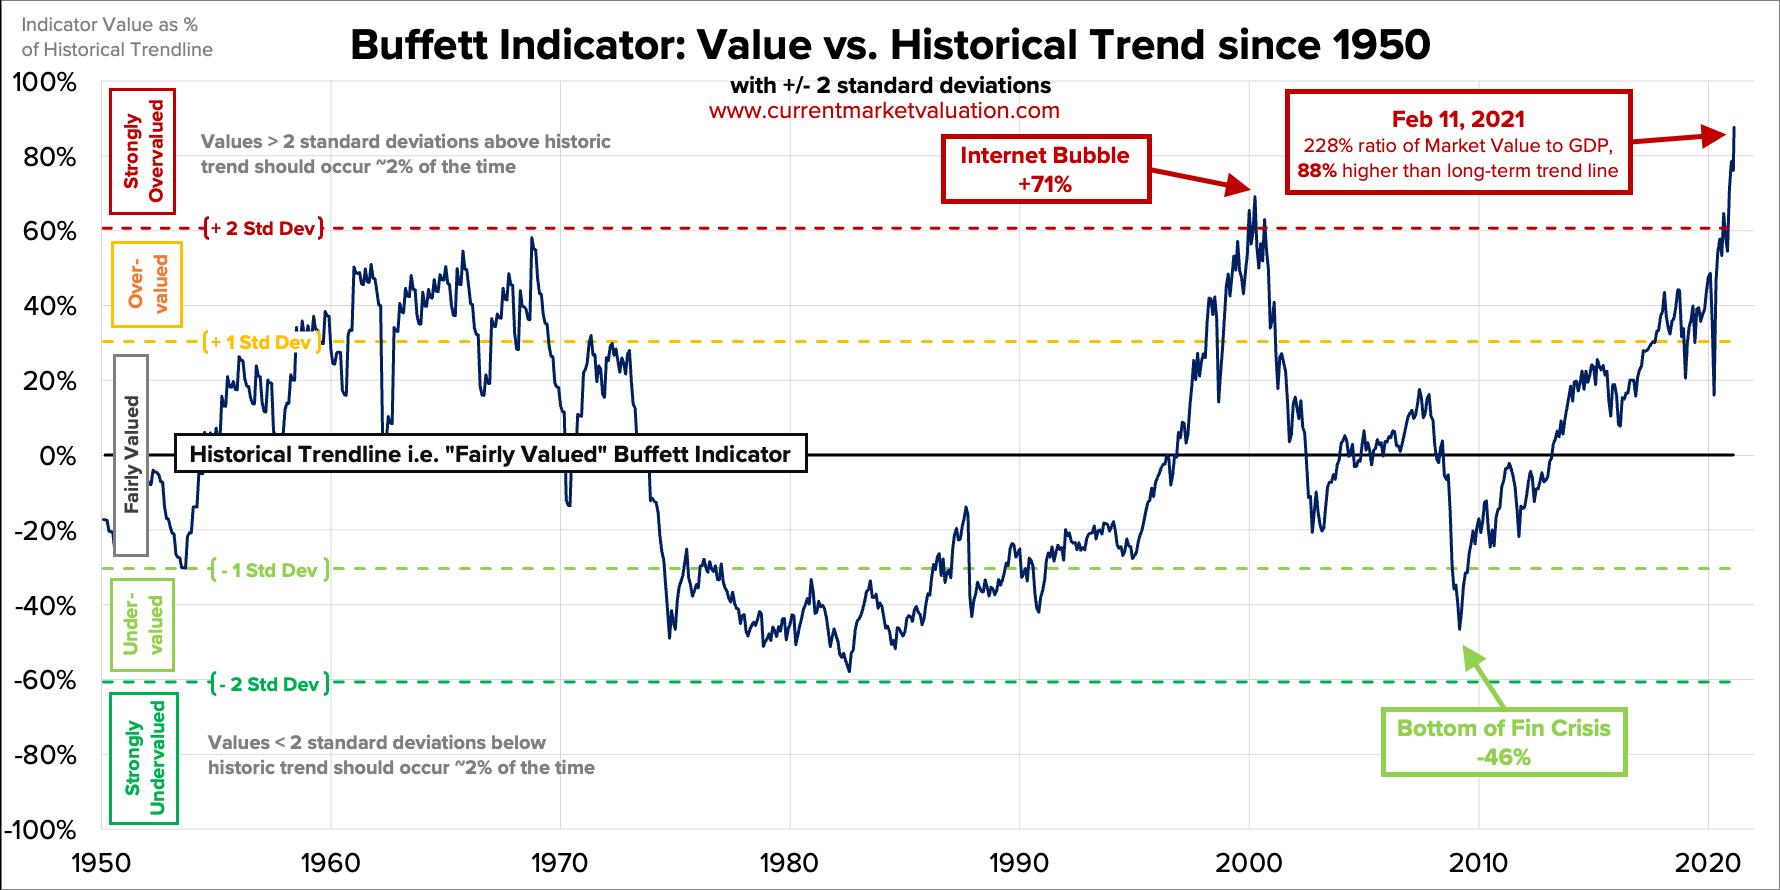 The Buffett Indicator - Stock Market Value to GDP